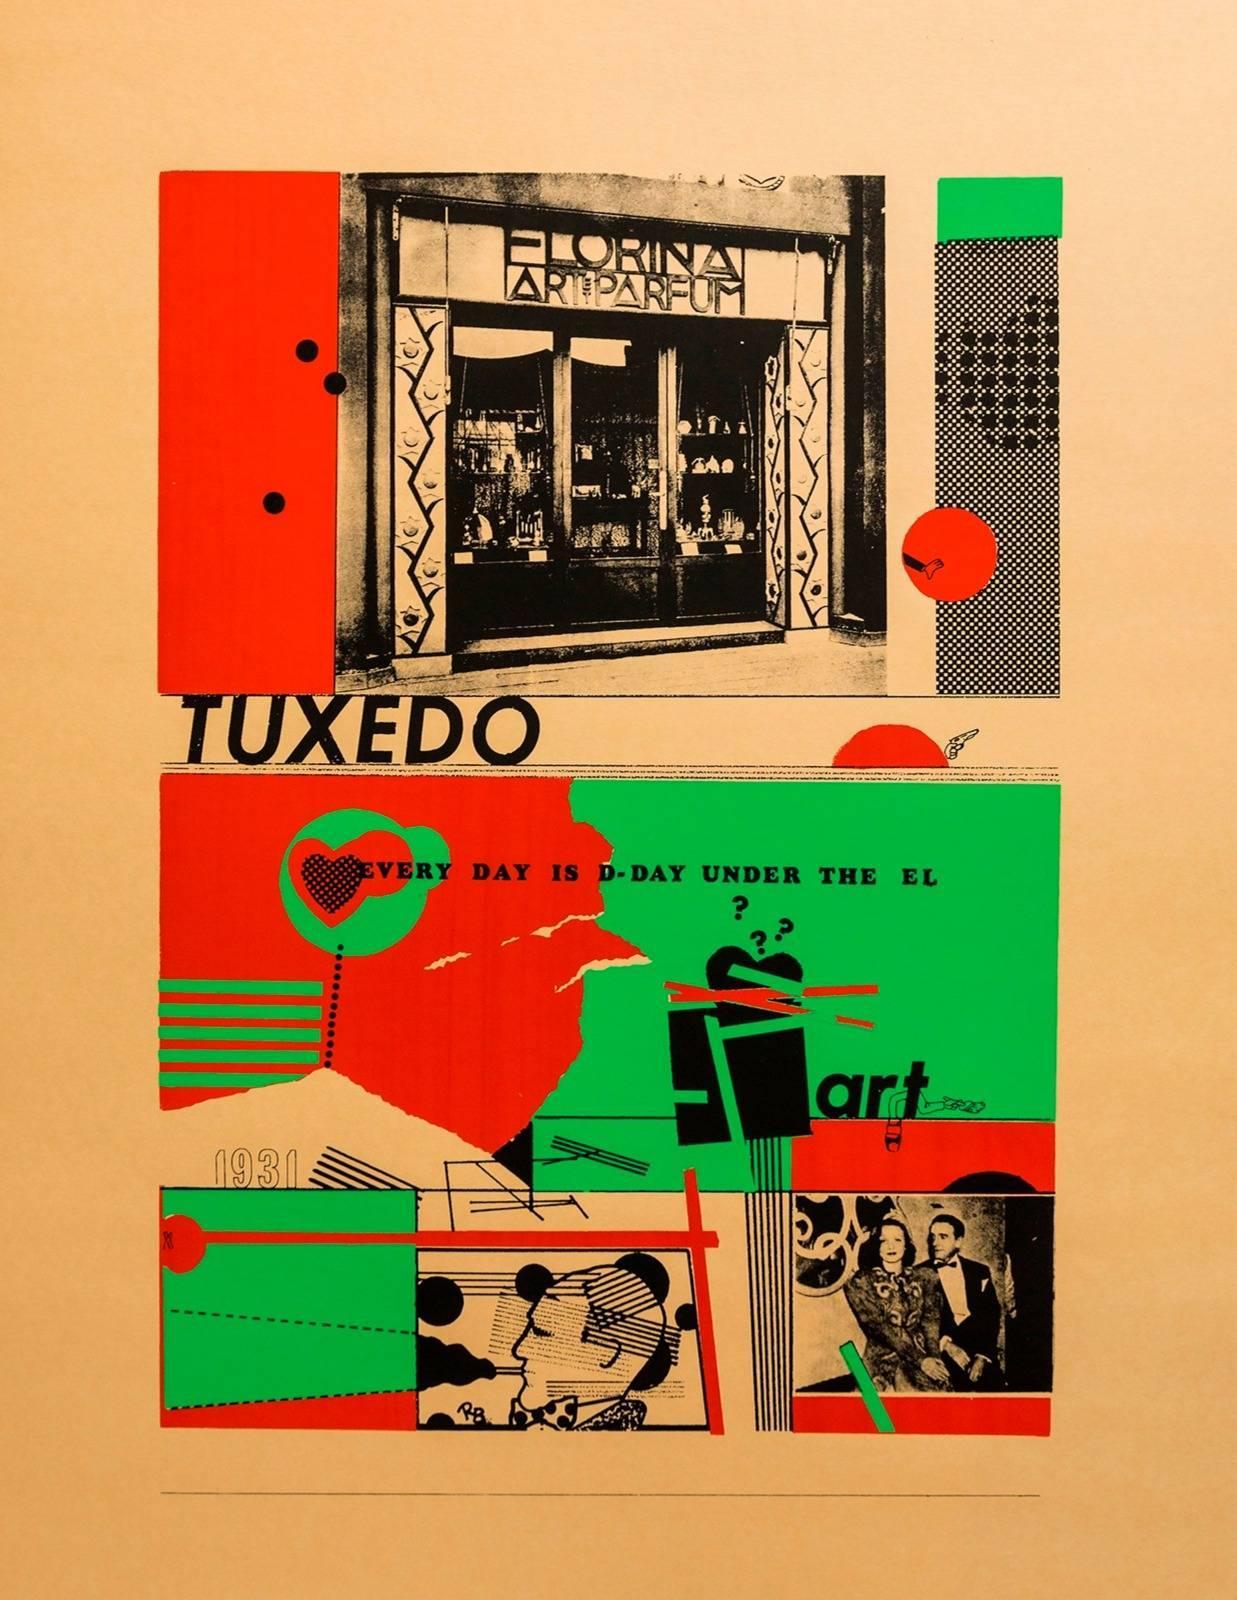 Art and perfume Tuxedo Pop Art Color Screenprint Richard Merkin